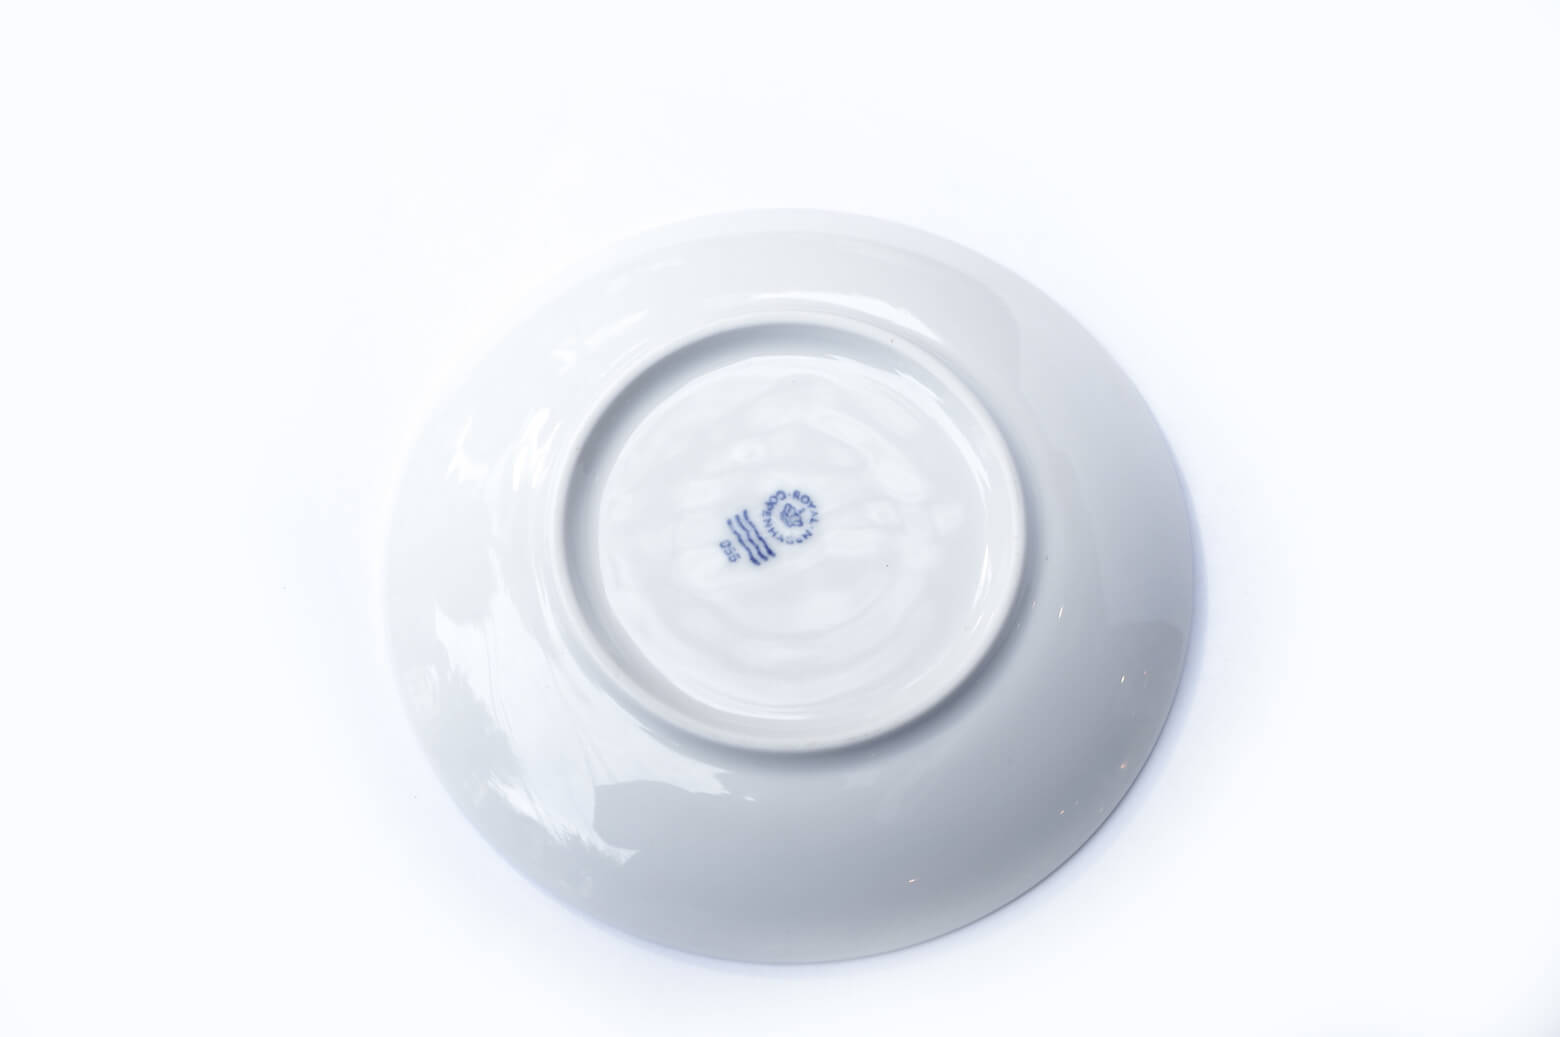 Royal Copenhagen WHITE POT Series/ロイヤル コペンハーゲン ホワイト ポット シリーズ カップ&ソーサー 北欧 食器 4